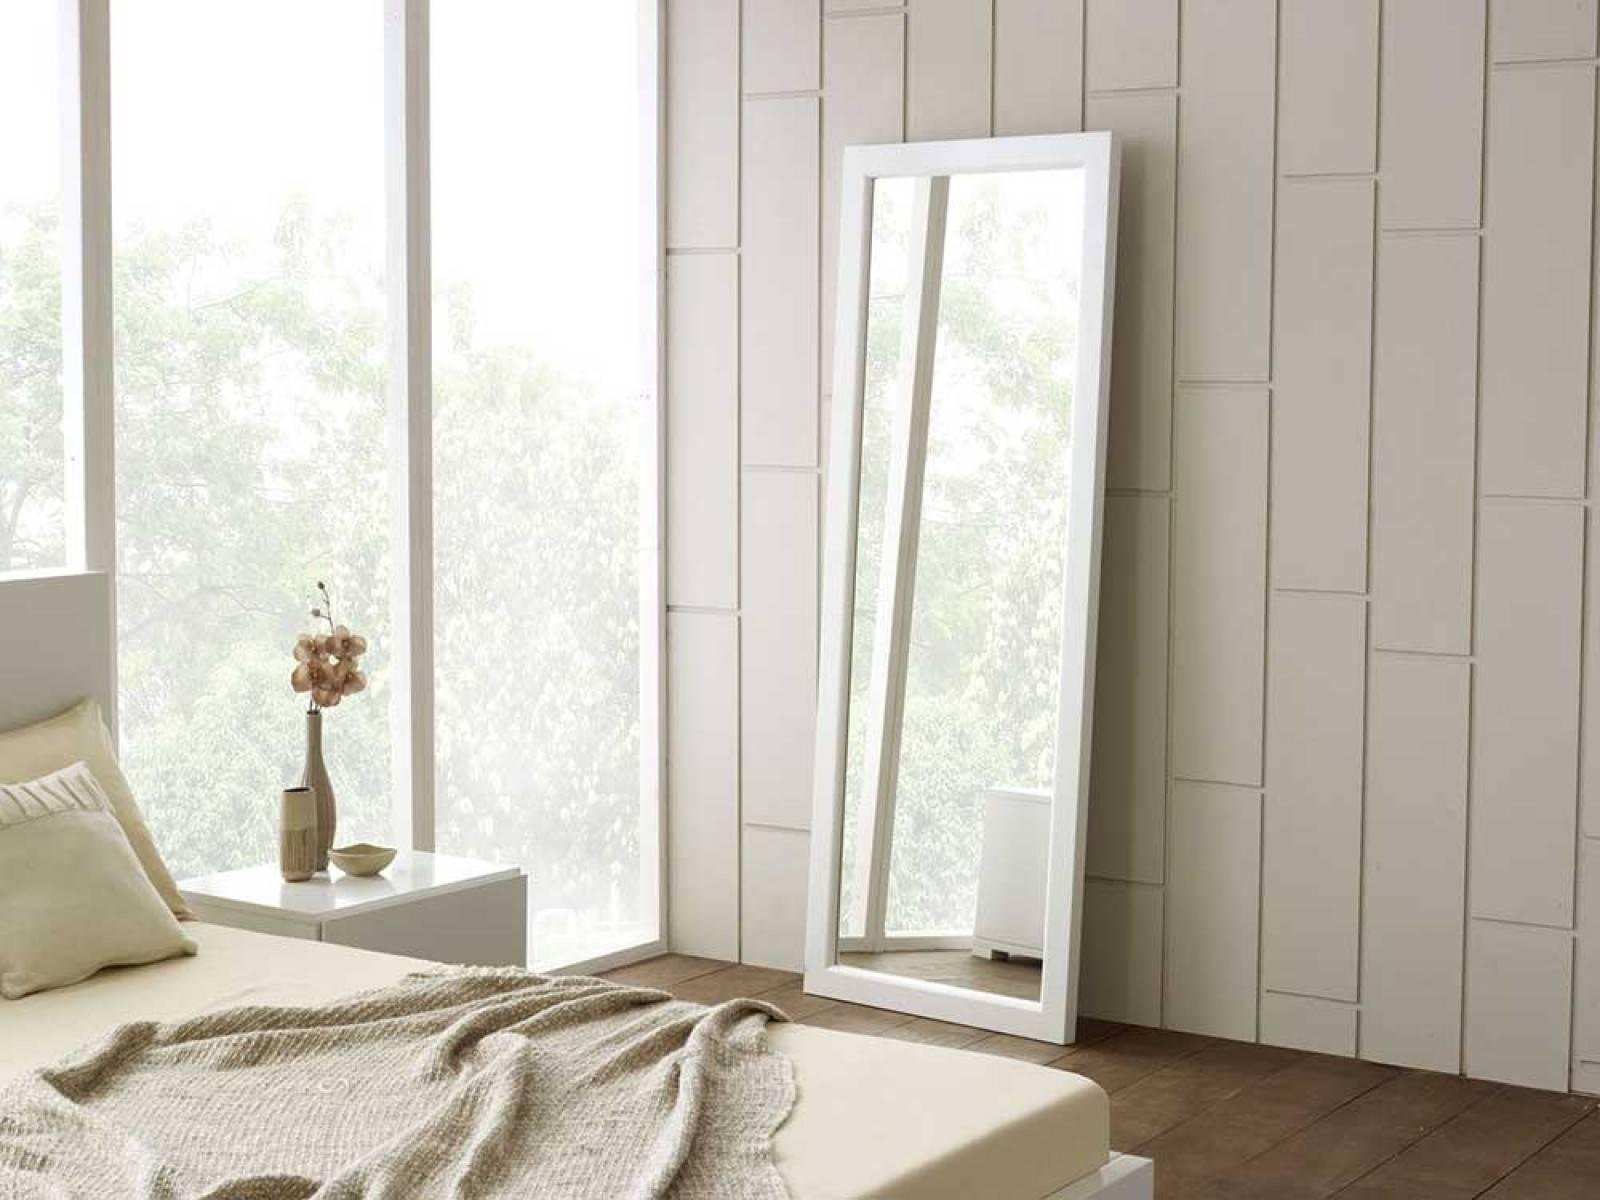 Homeware: Oval Full Length Standing Mirror | Large Floor Mirrors With Oval Freestanding Mirrors (View 22 of 25)